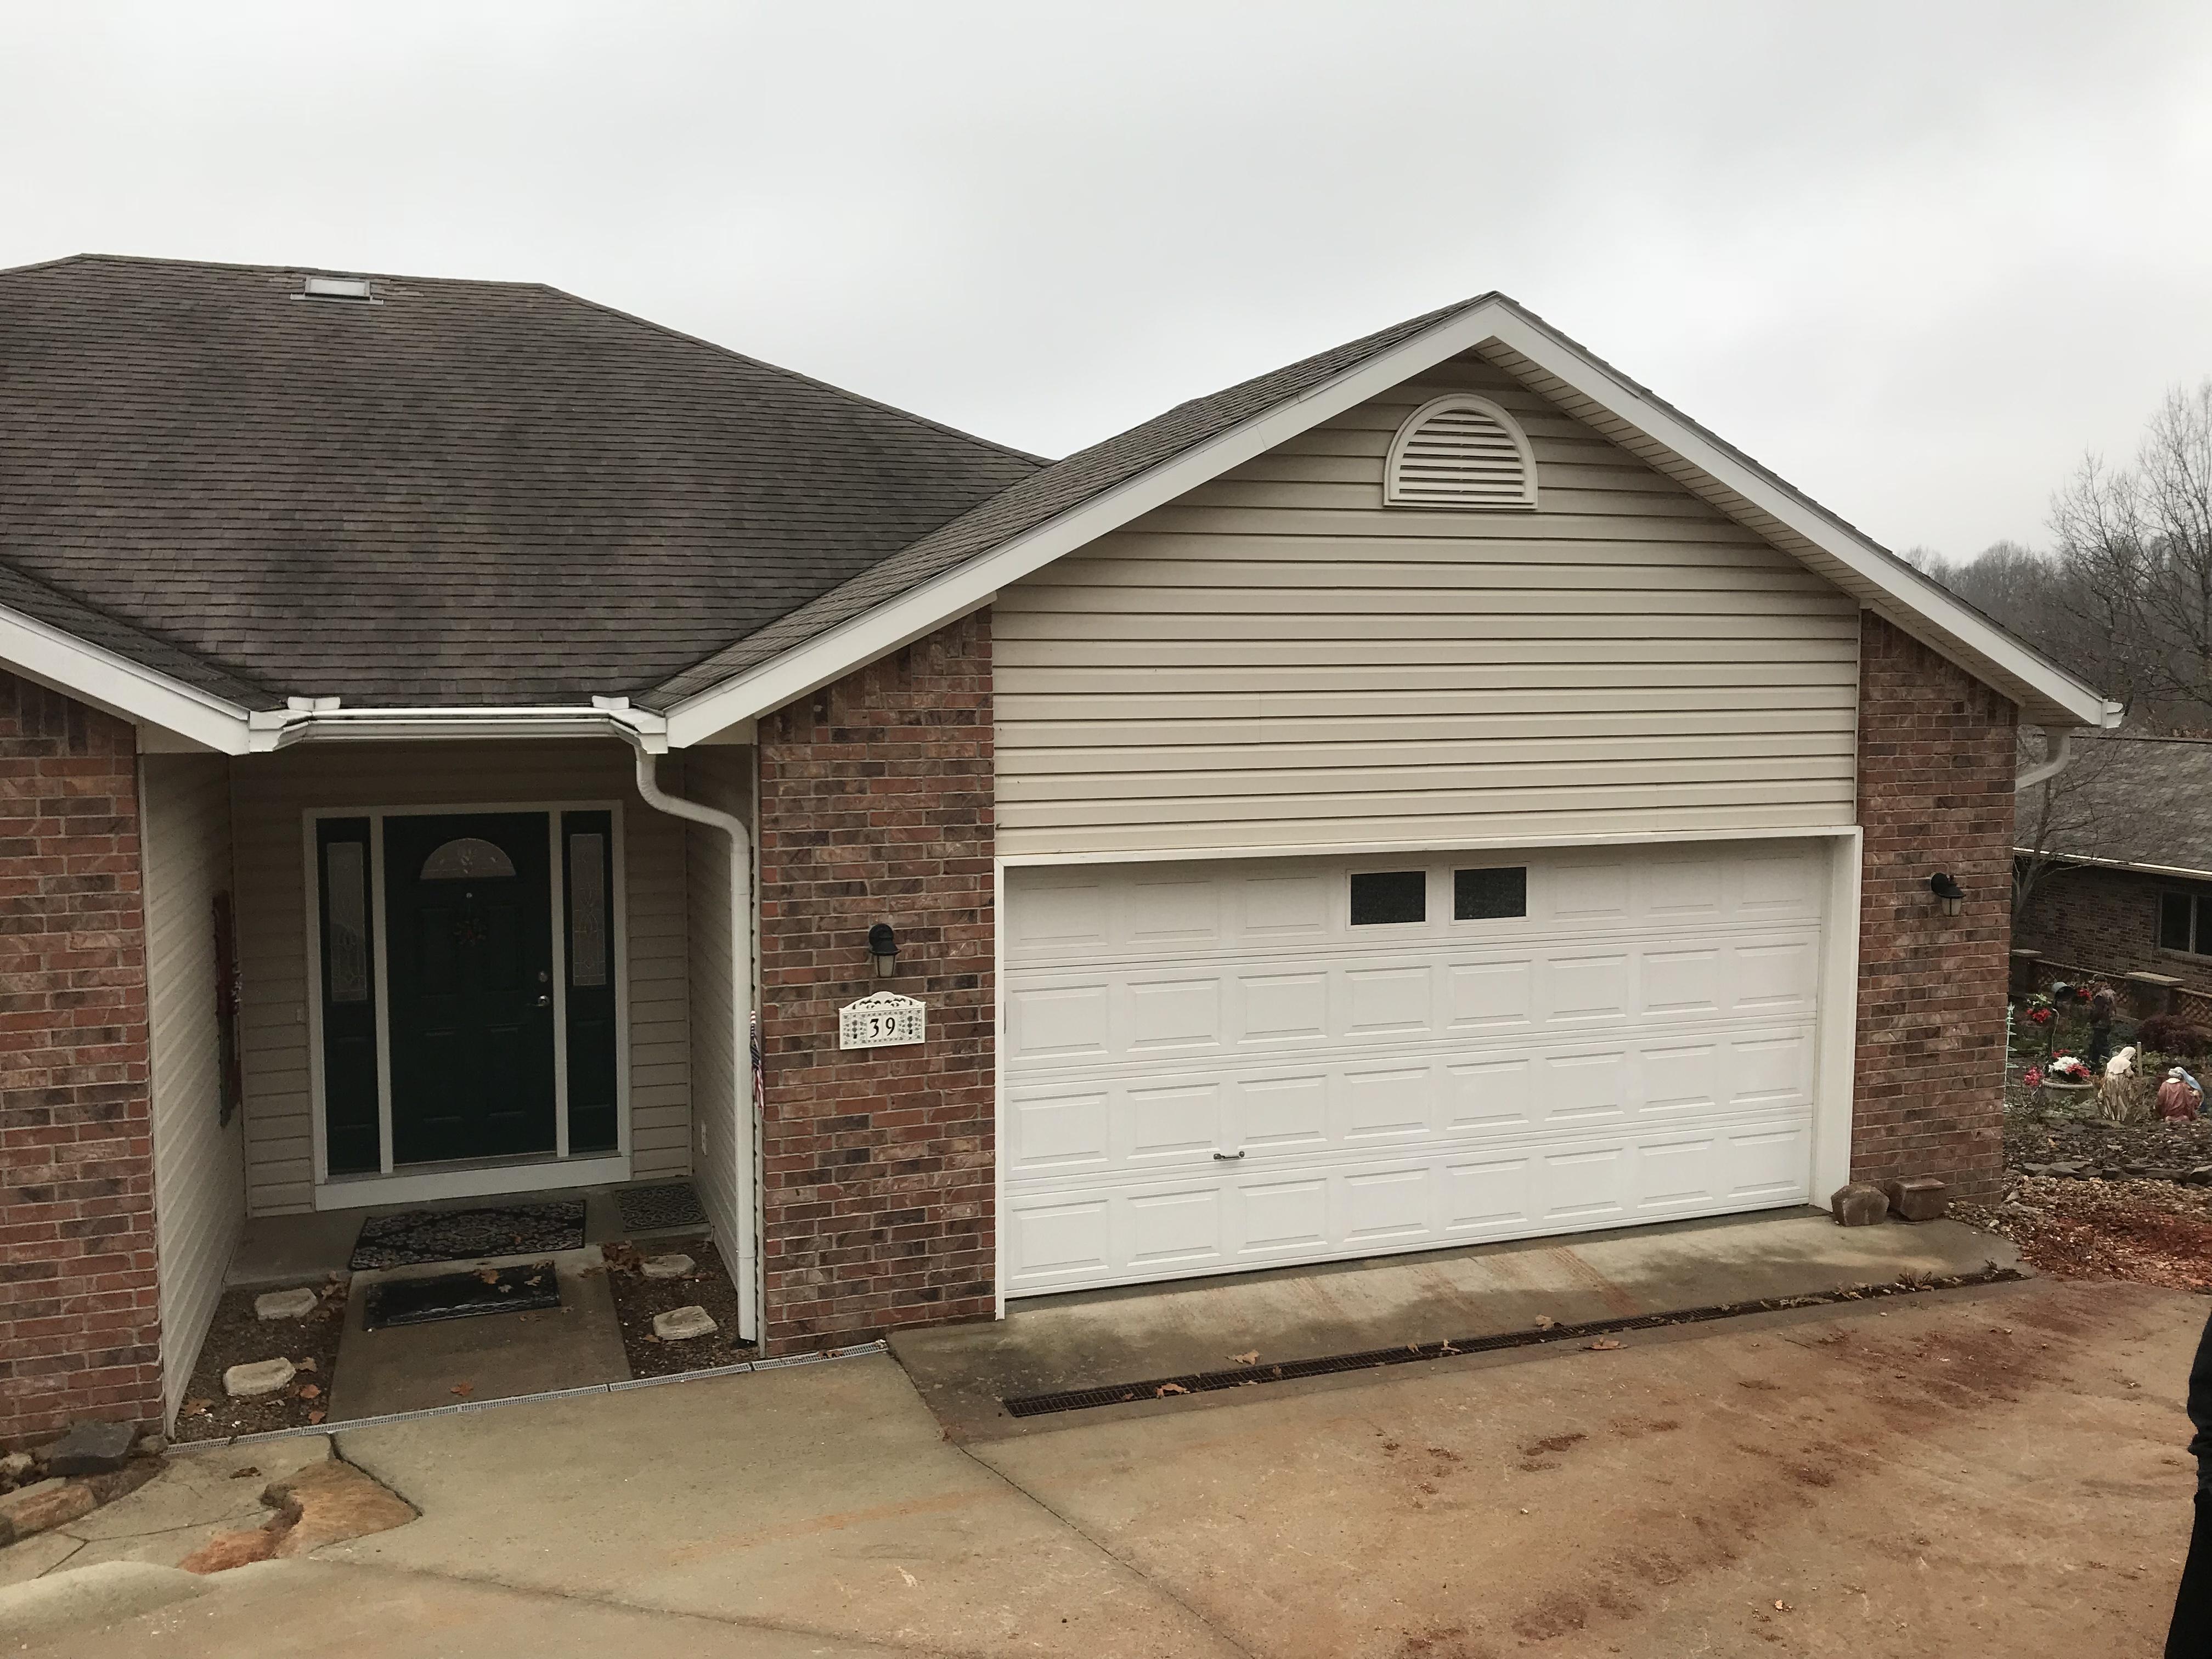 Second floor garage addition-dda9ce35-880d-46cf-8576-e2927a21700b_1513945767441.jpeg